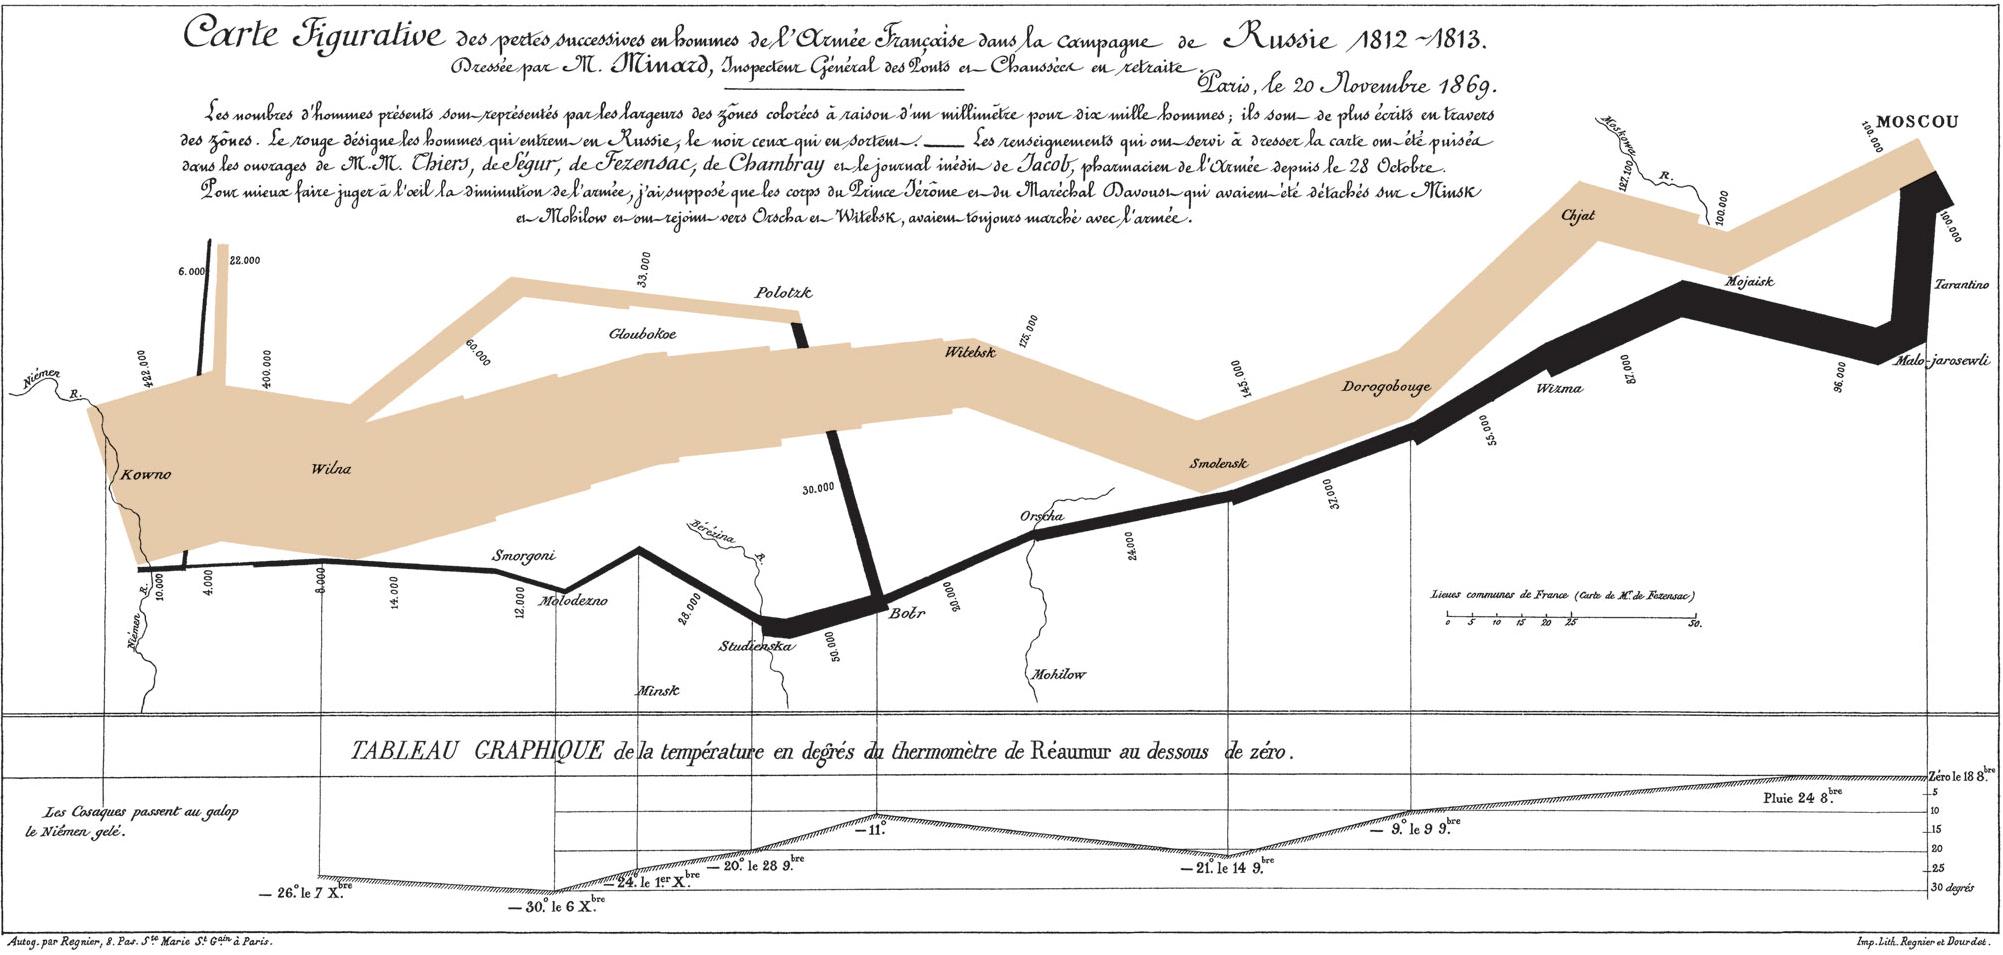 Minard 1812 infographic